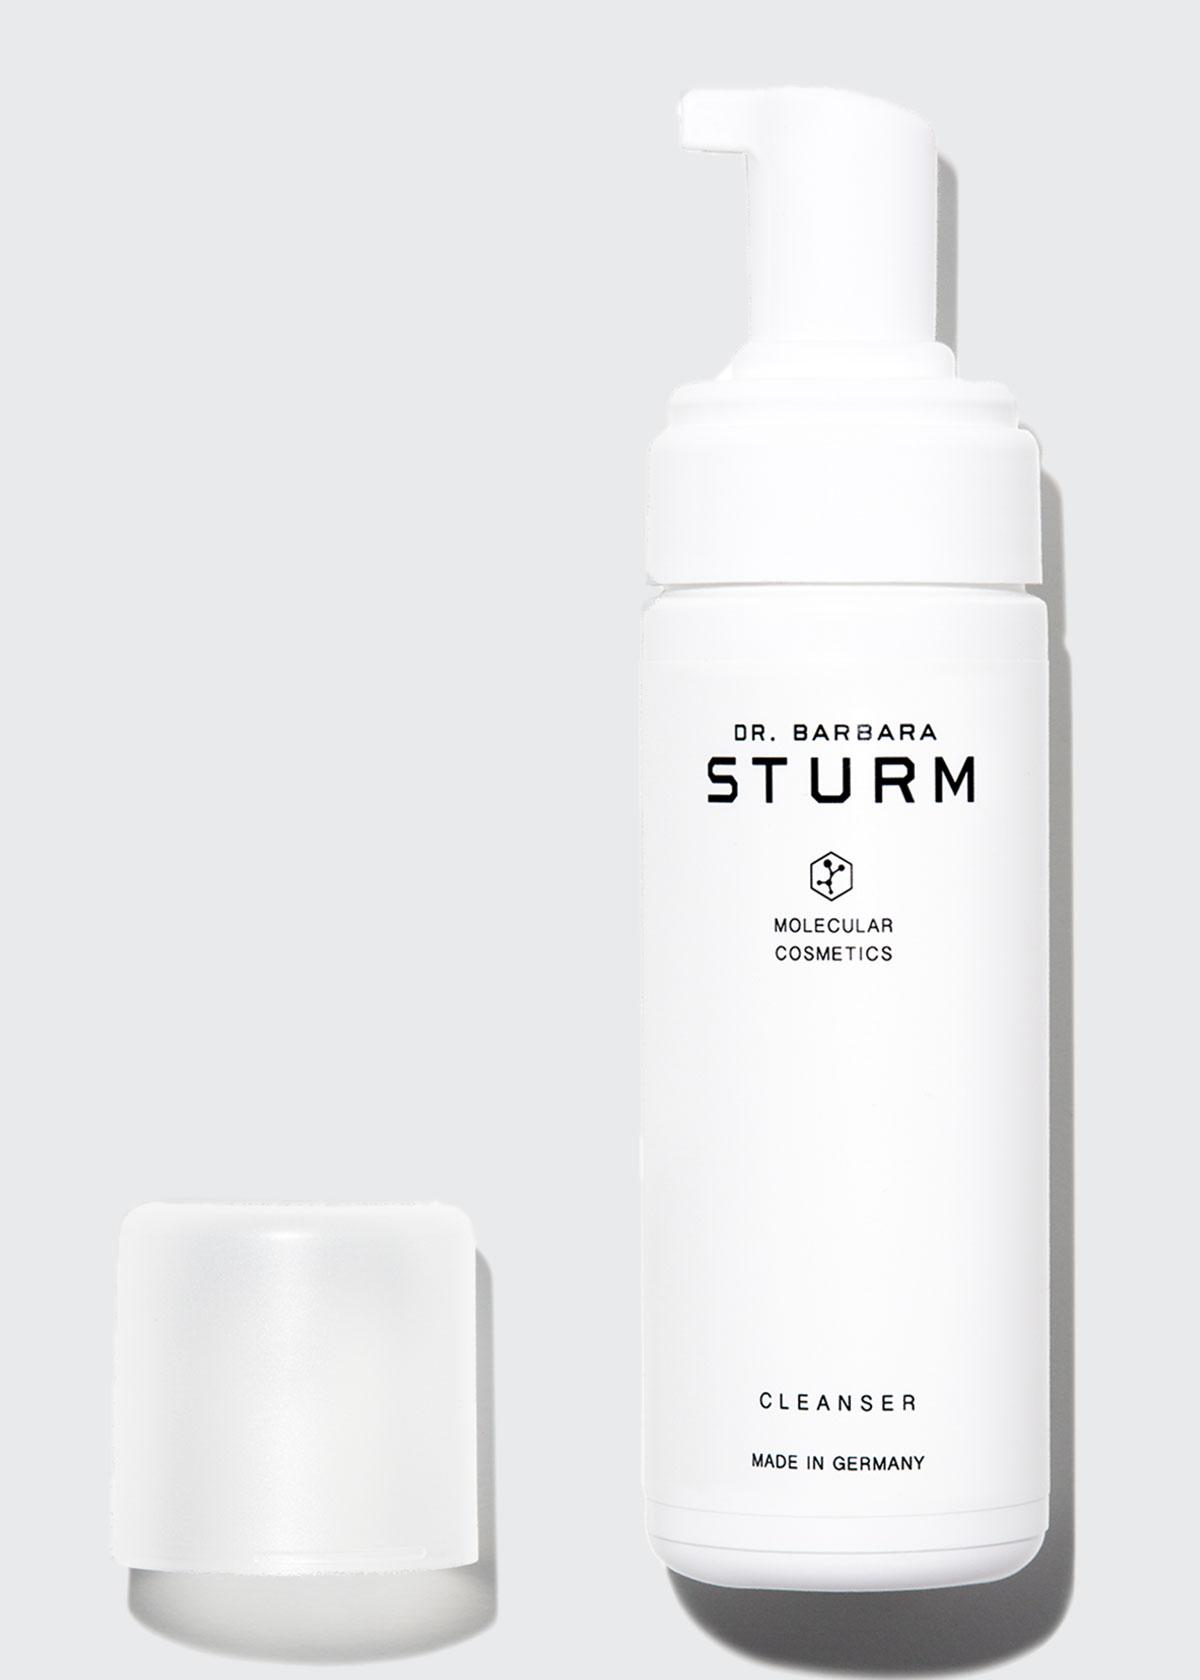 Dr. Barbara Sturm CLEANSER, 5.0 OZ./ 150 ML